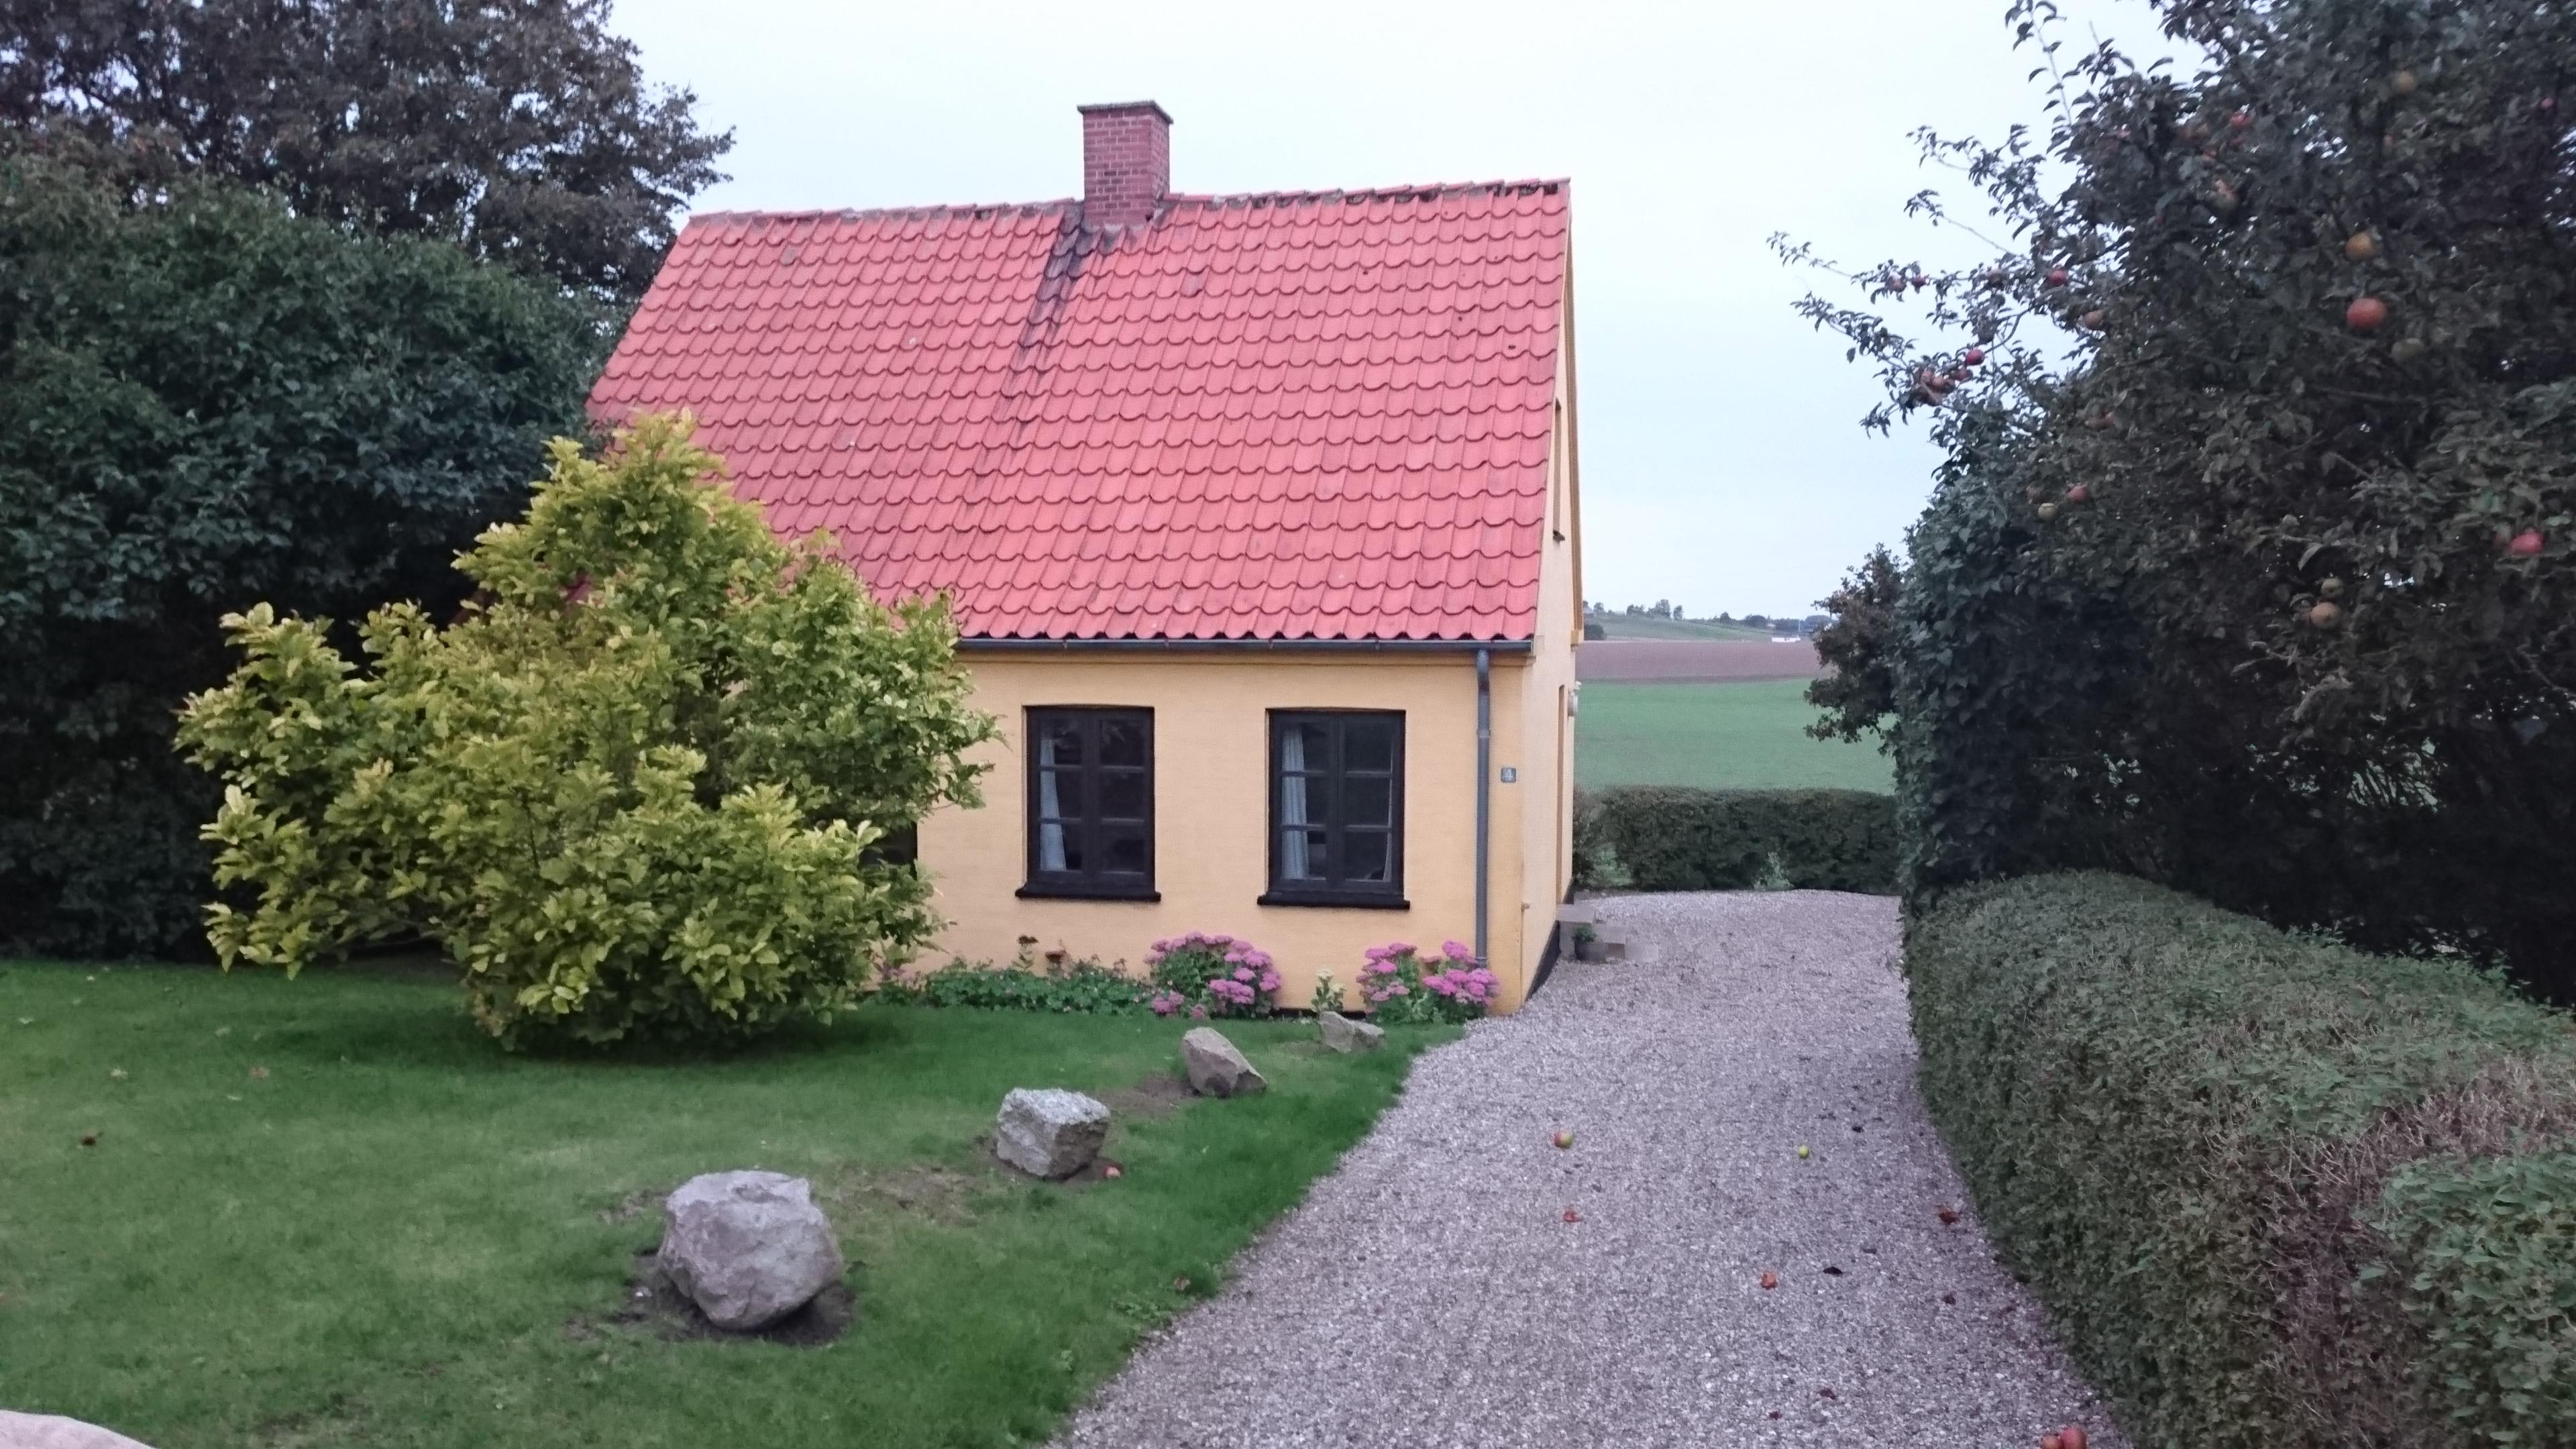 Graver boligen